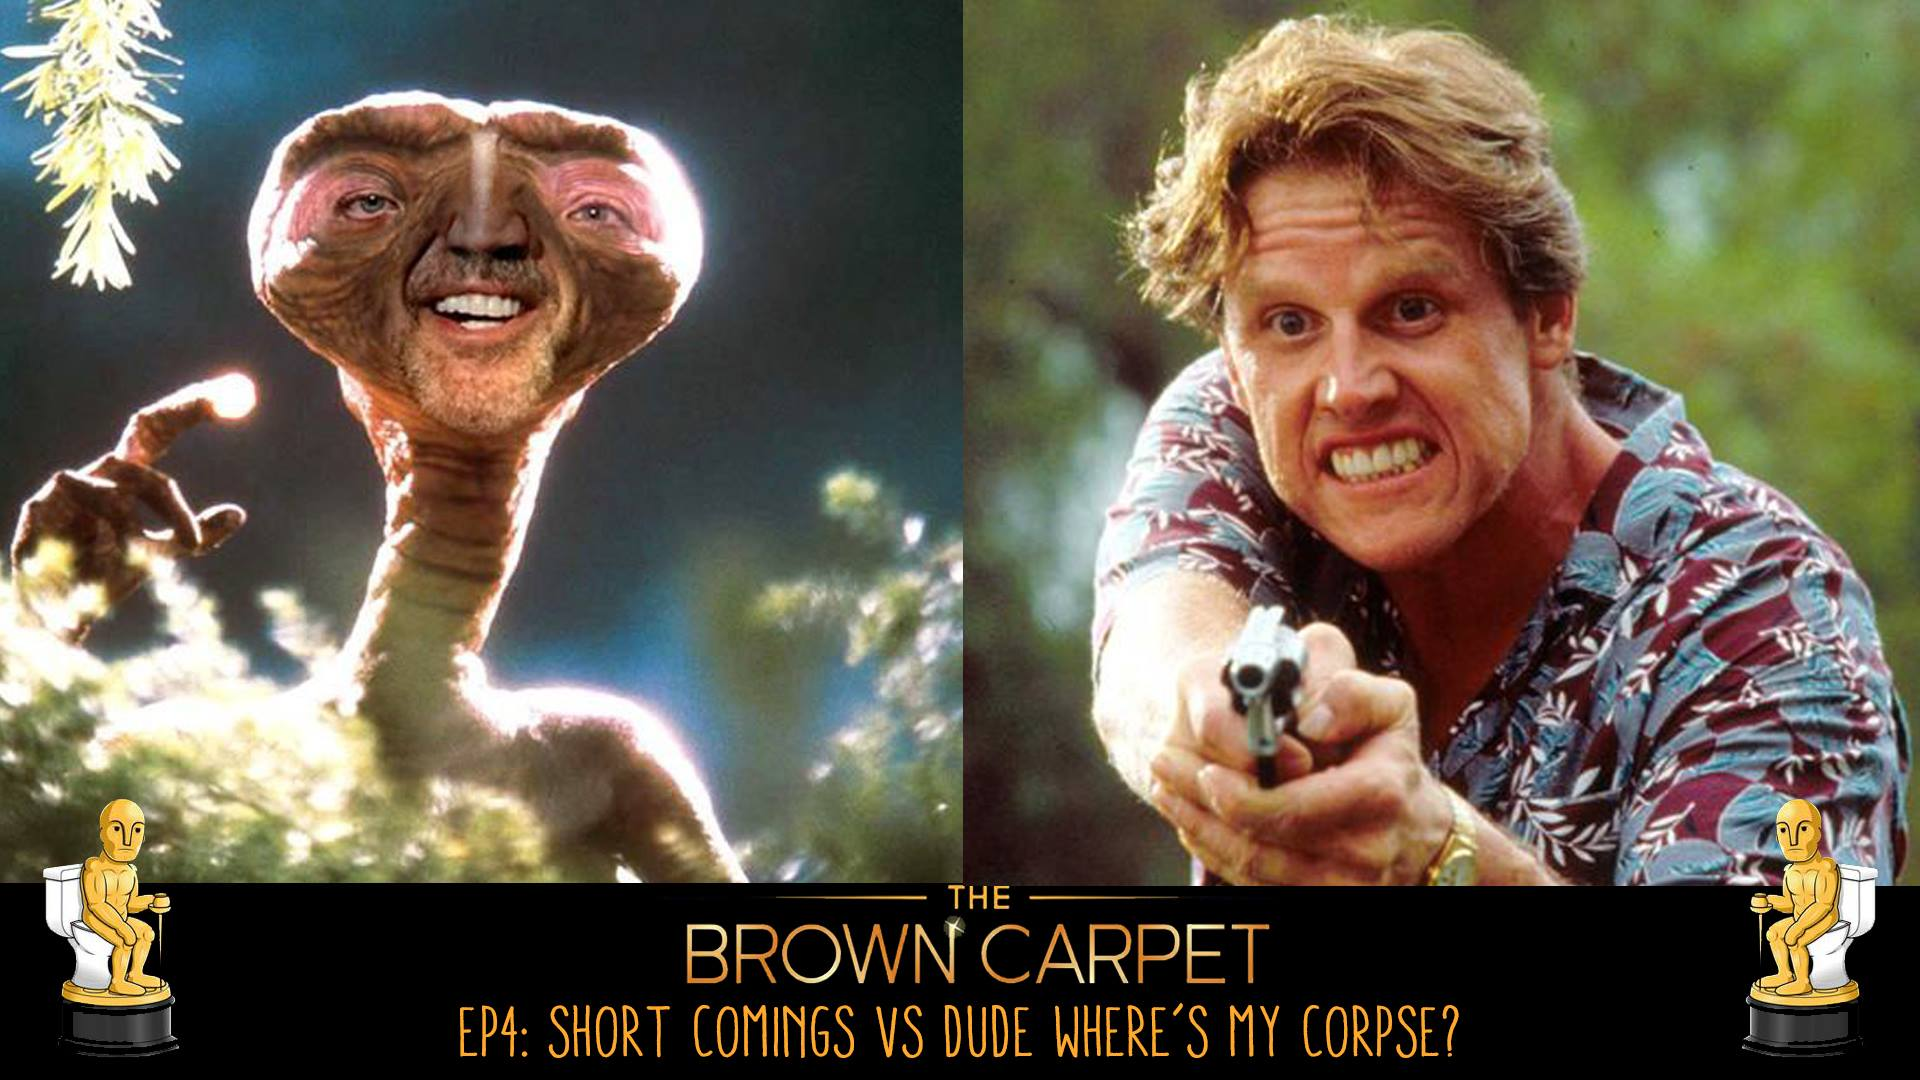 05/12/17 - E04 - Short Comings vs Dude, Where's My Corpse?